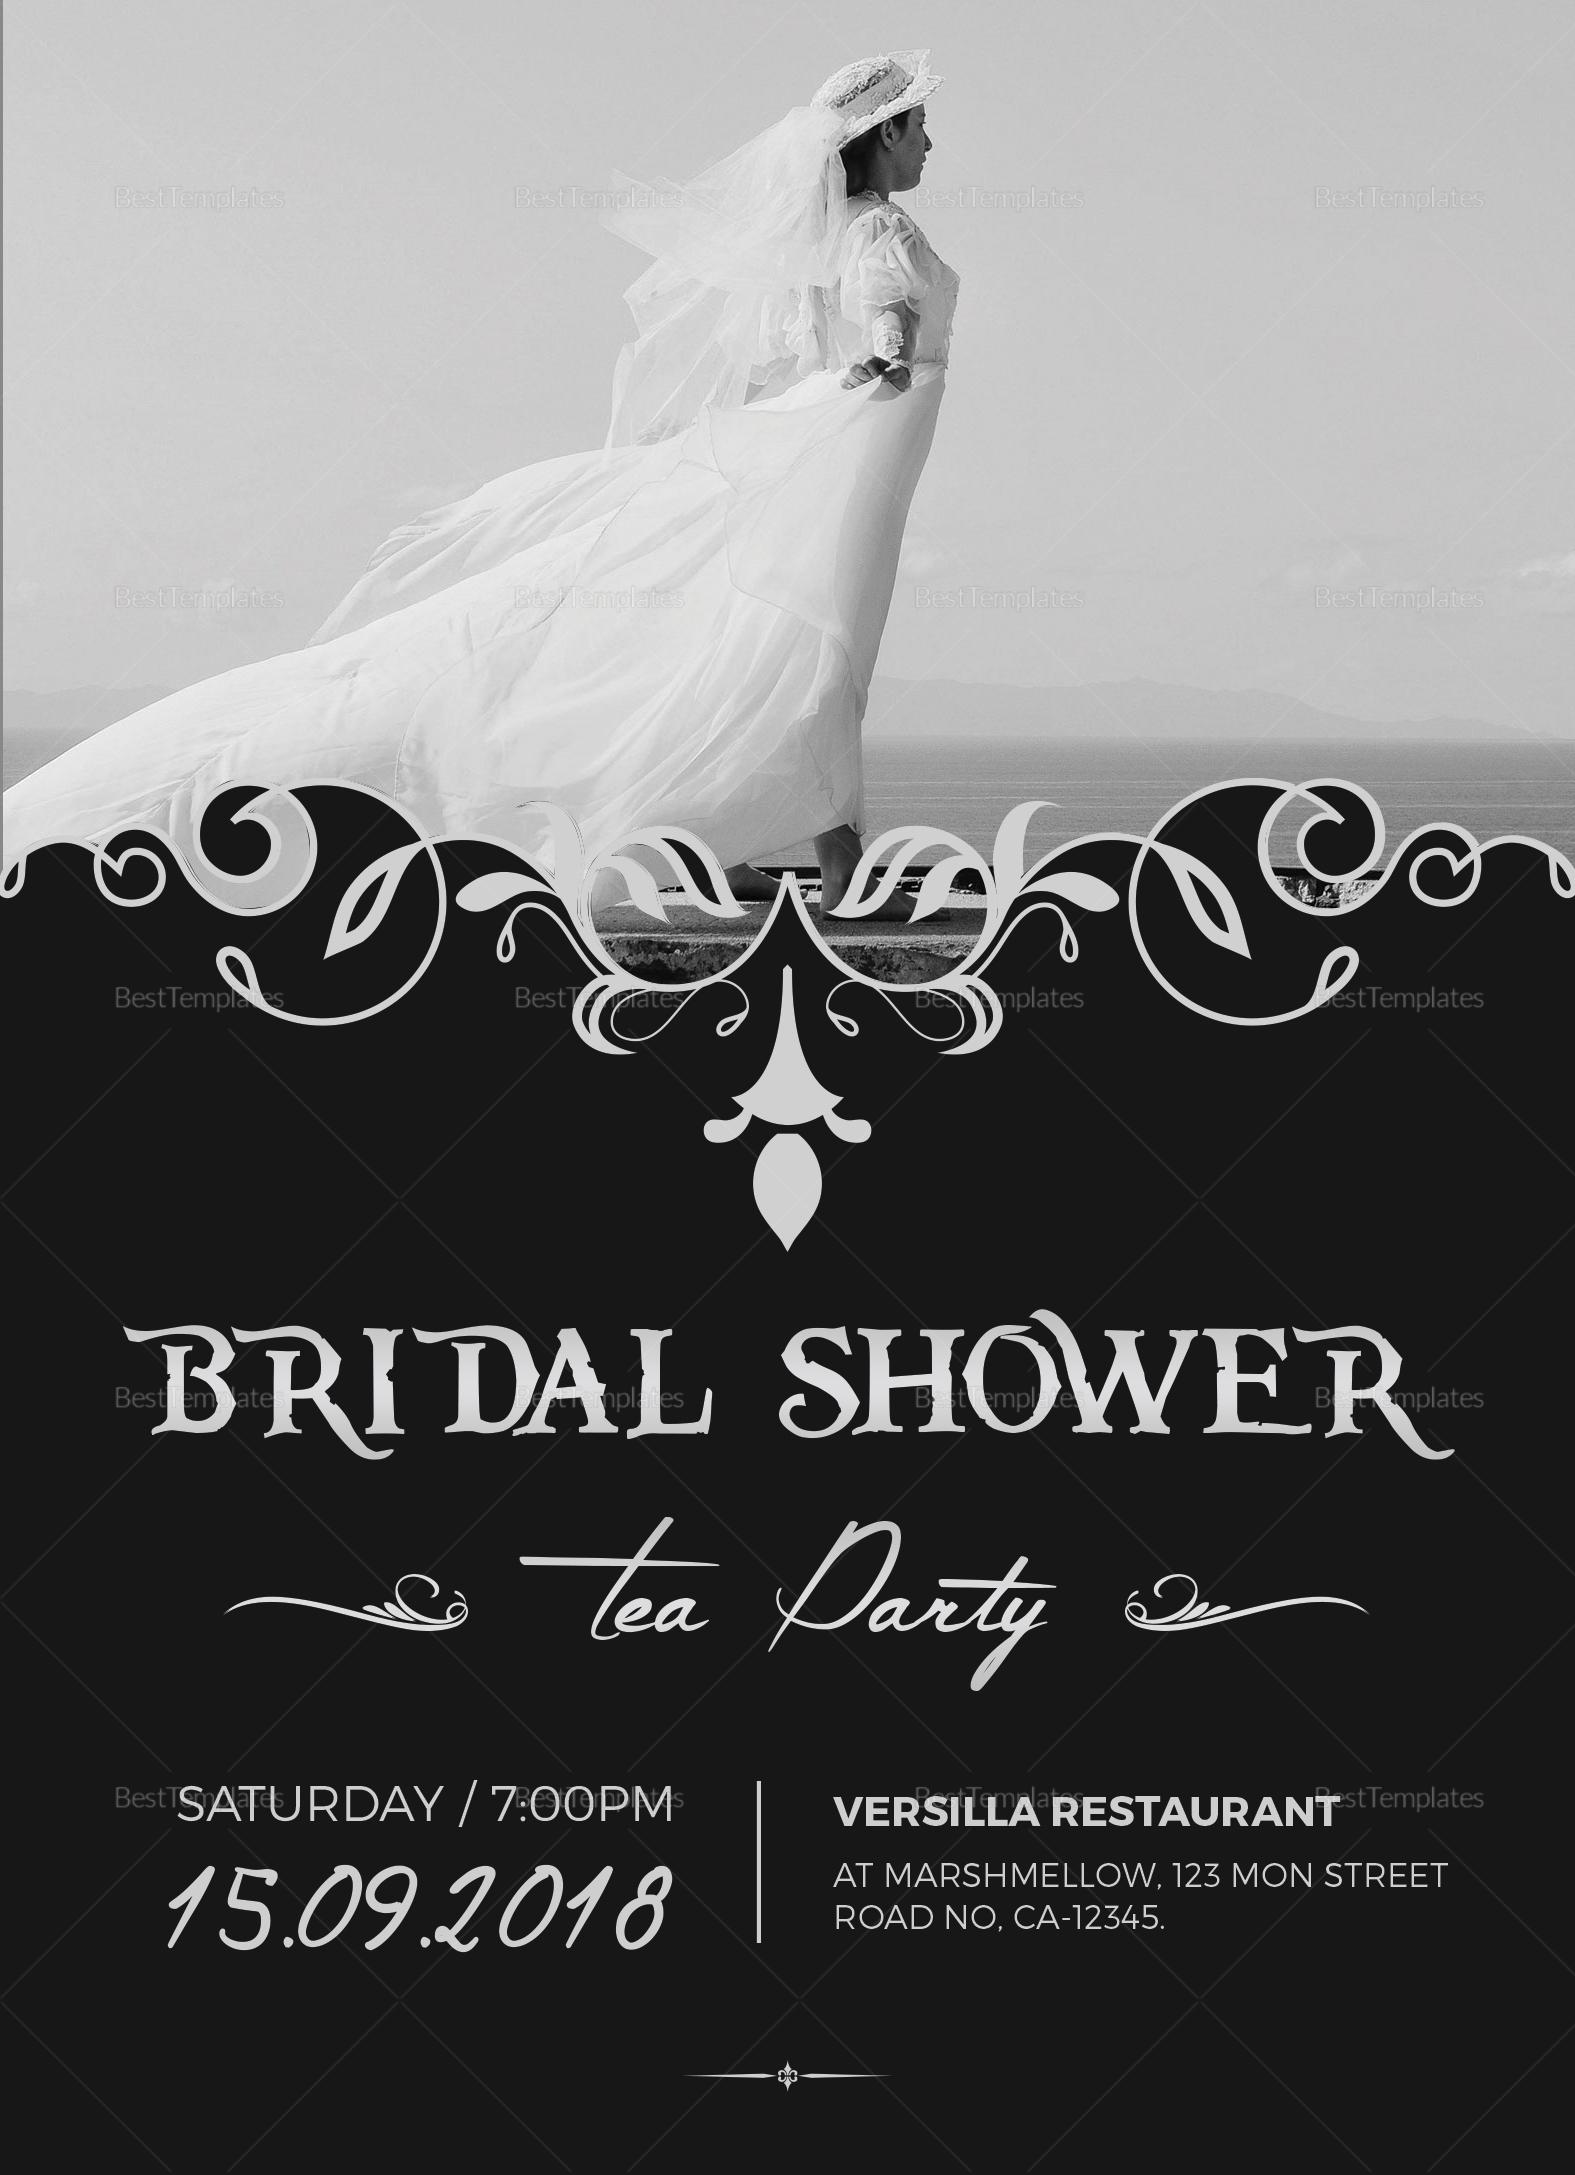 Bridal Shower Tea Party Invitation Design Template